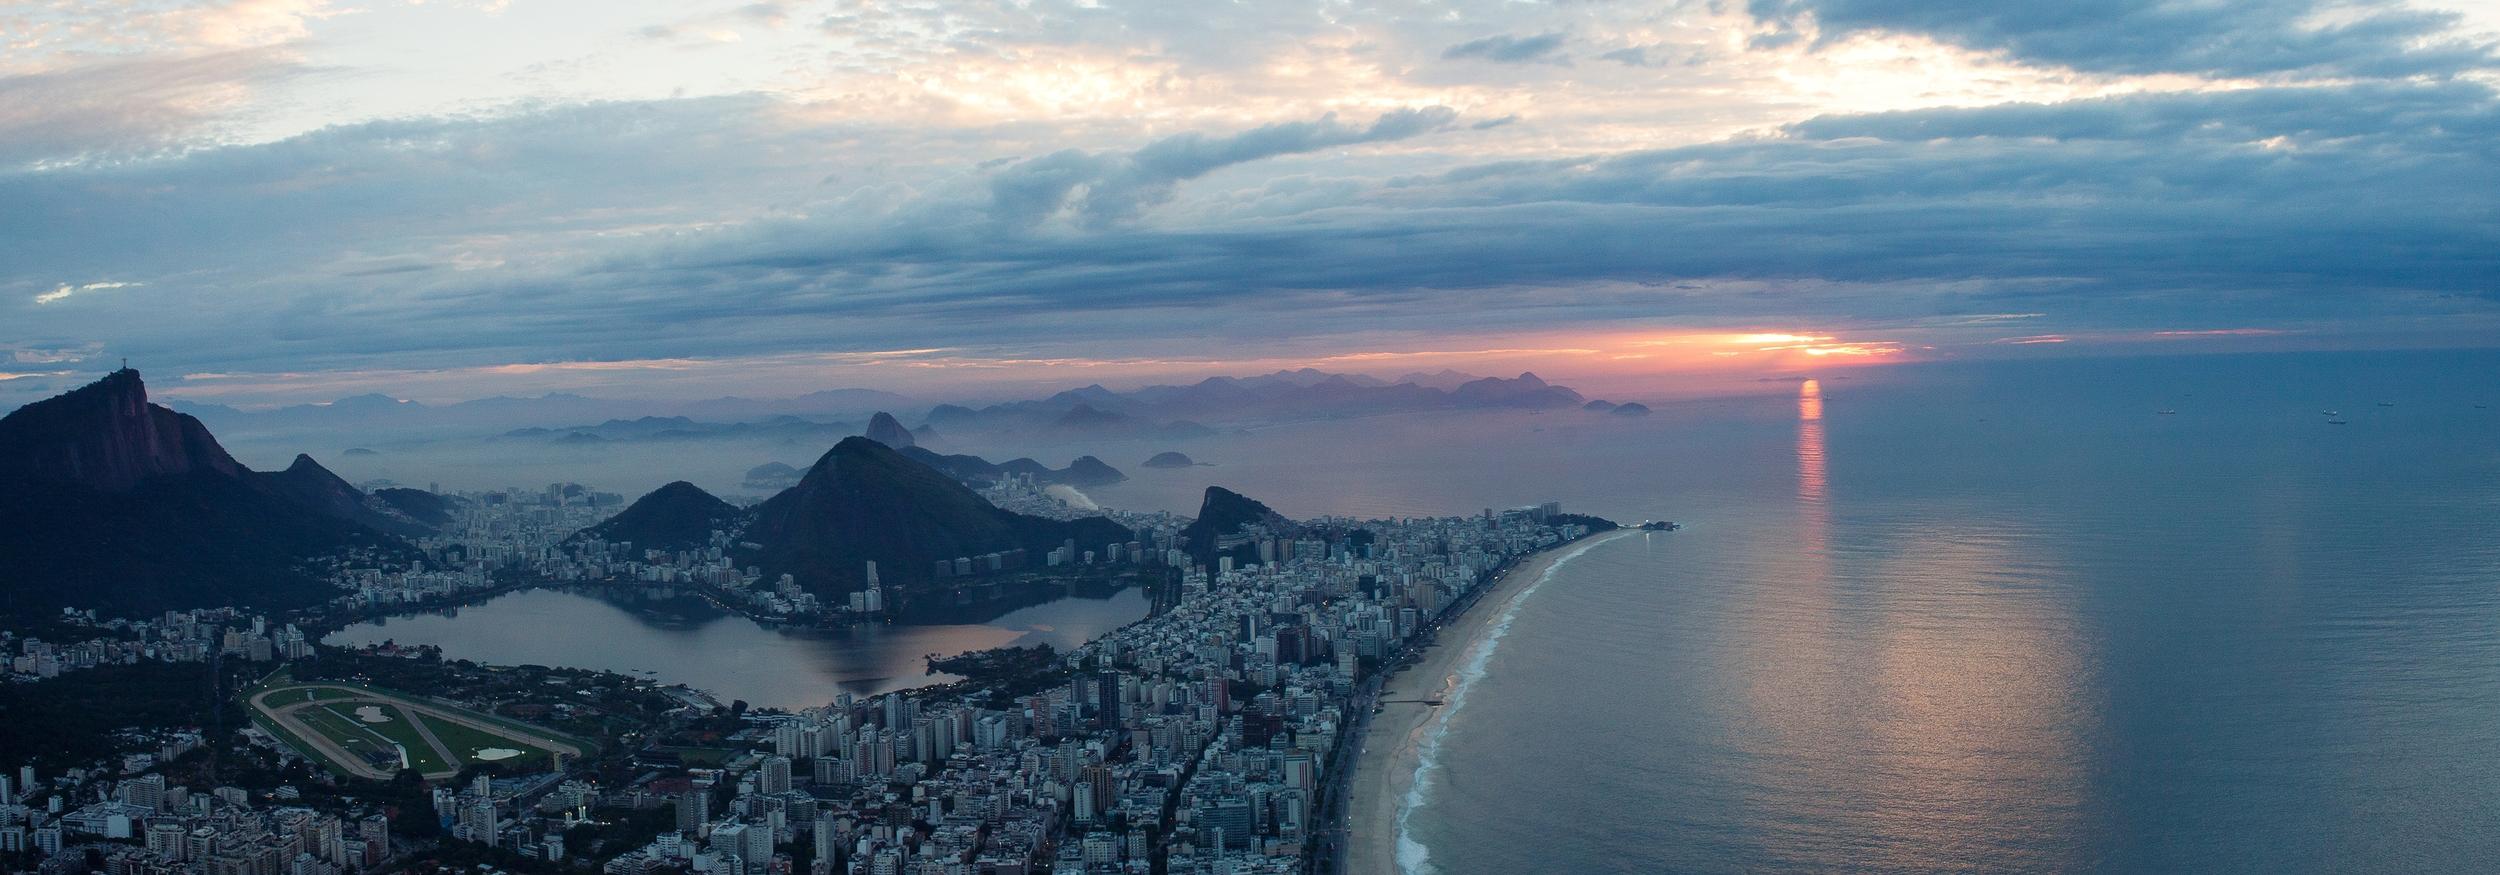 Rio de Janeiro, Brazil, landscape, travel photography, panorama, Two Brothers, Dos Irmaos, sunrise